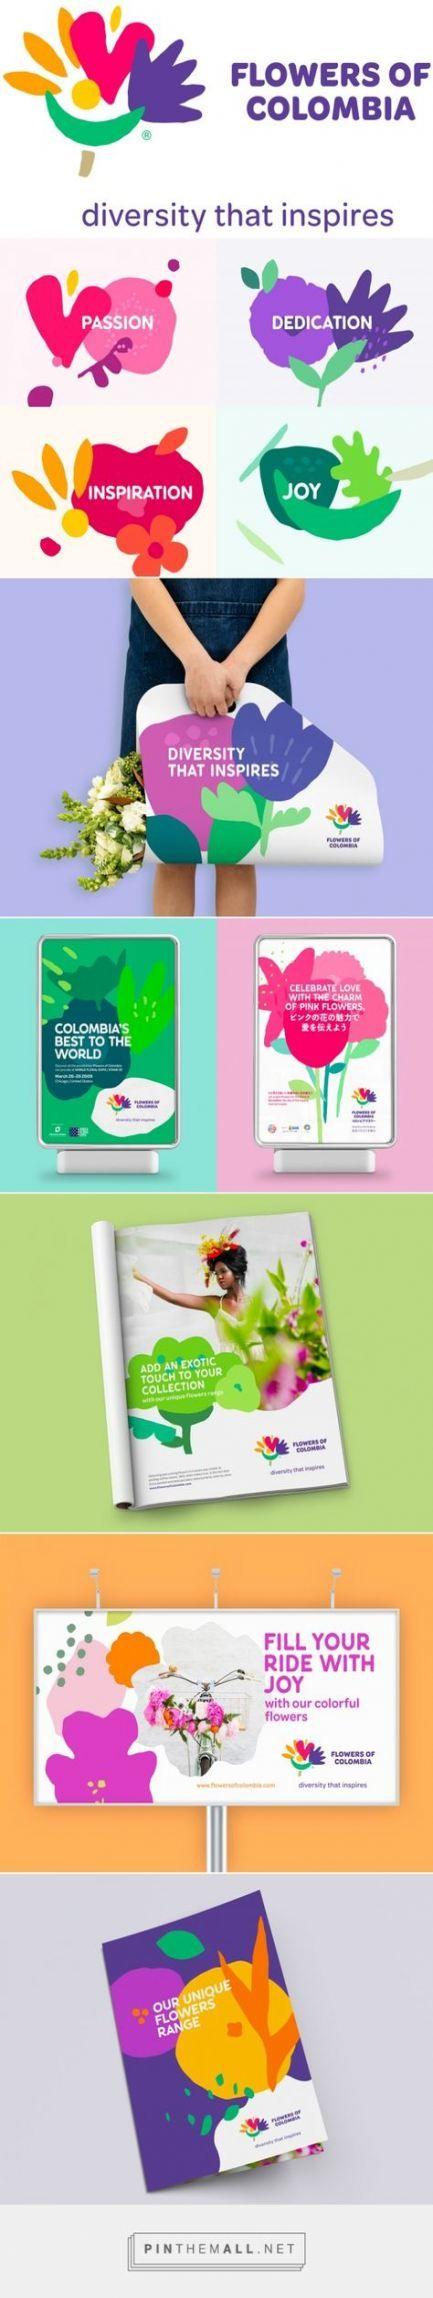 Flowers logo brand identity corporate design 57 ideas